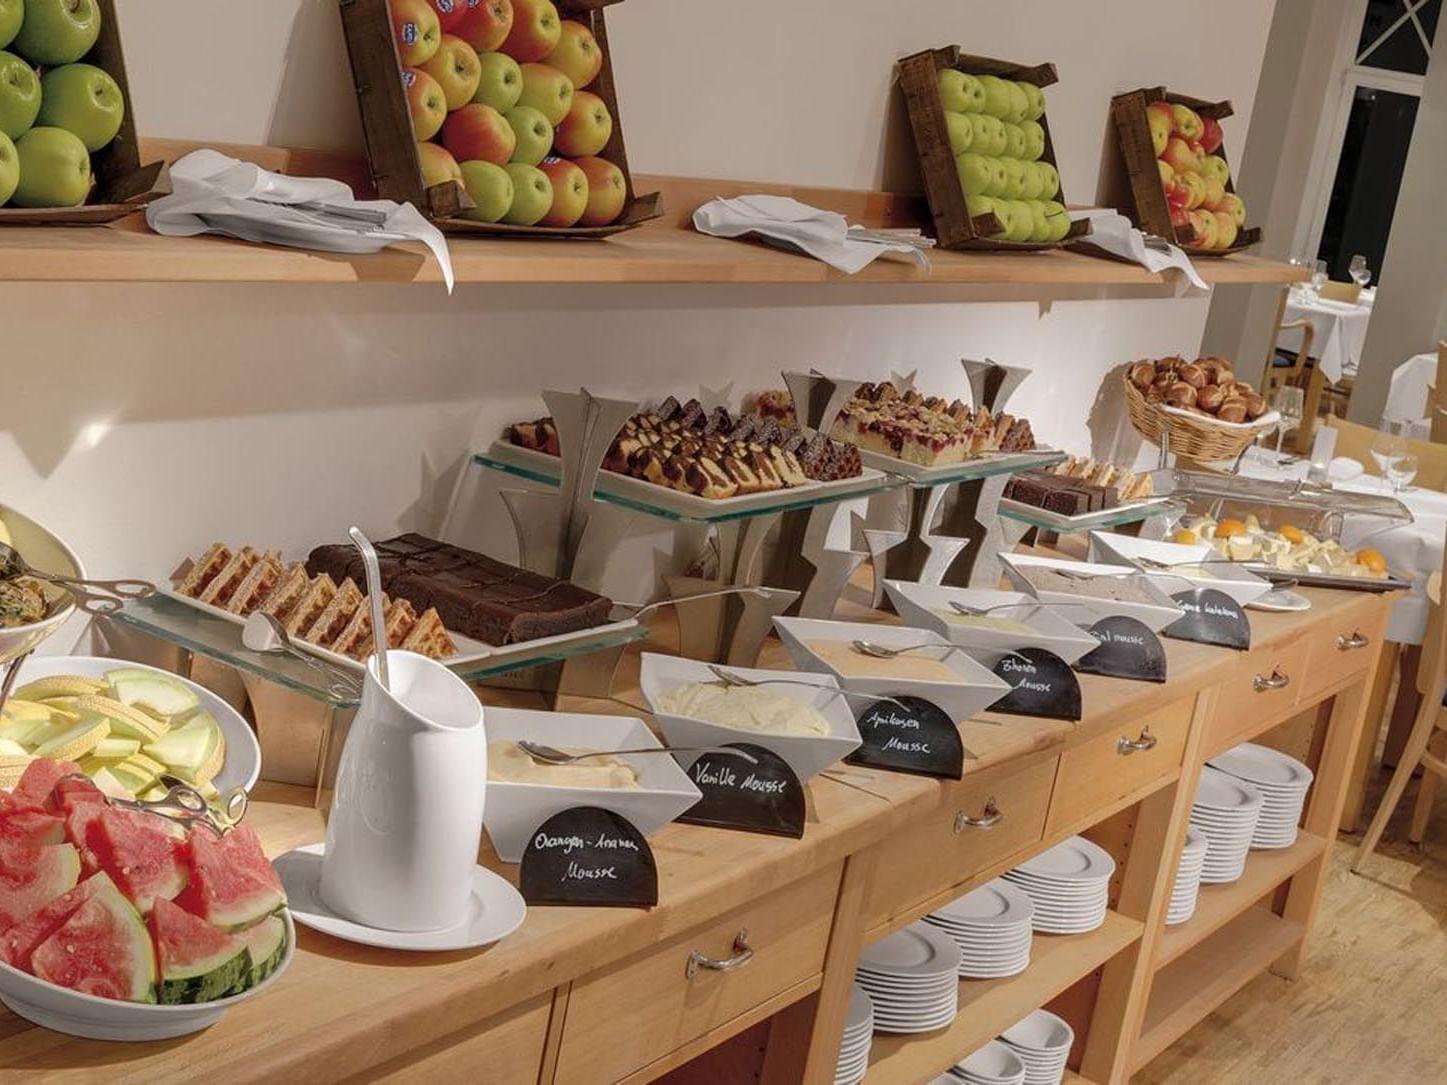 breakfast at Precise Resort Marina Wolfsbruch